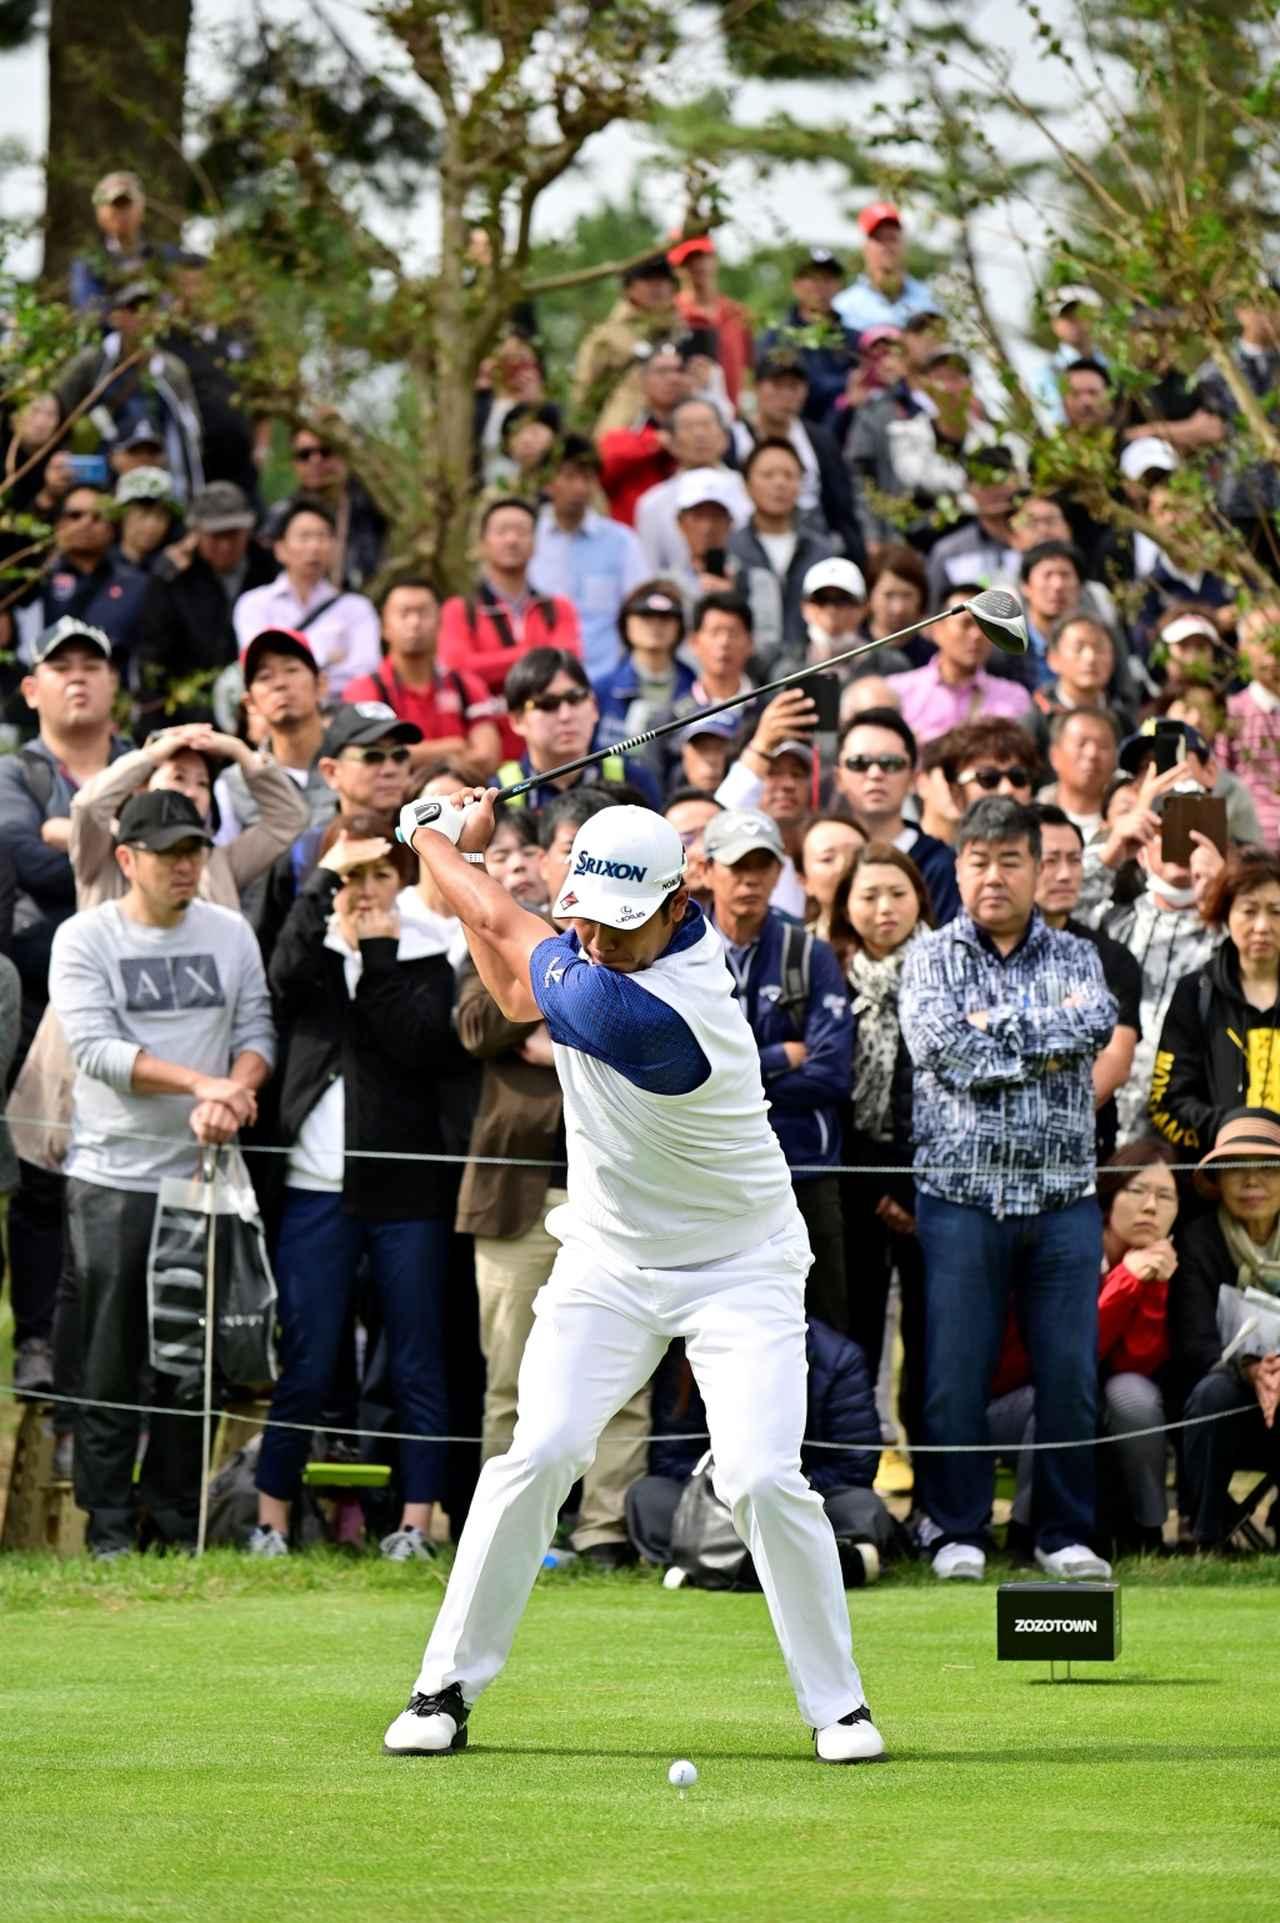 Images : 5番目の画像 - 松山英樹のドライバー連続写真 - みんなのゴルフダイジェスト